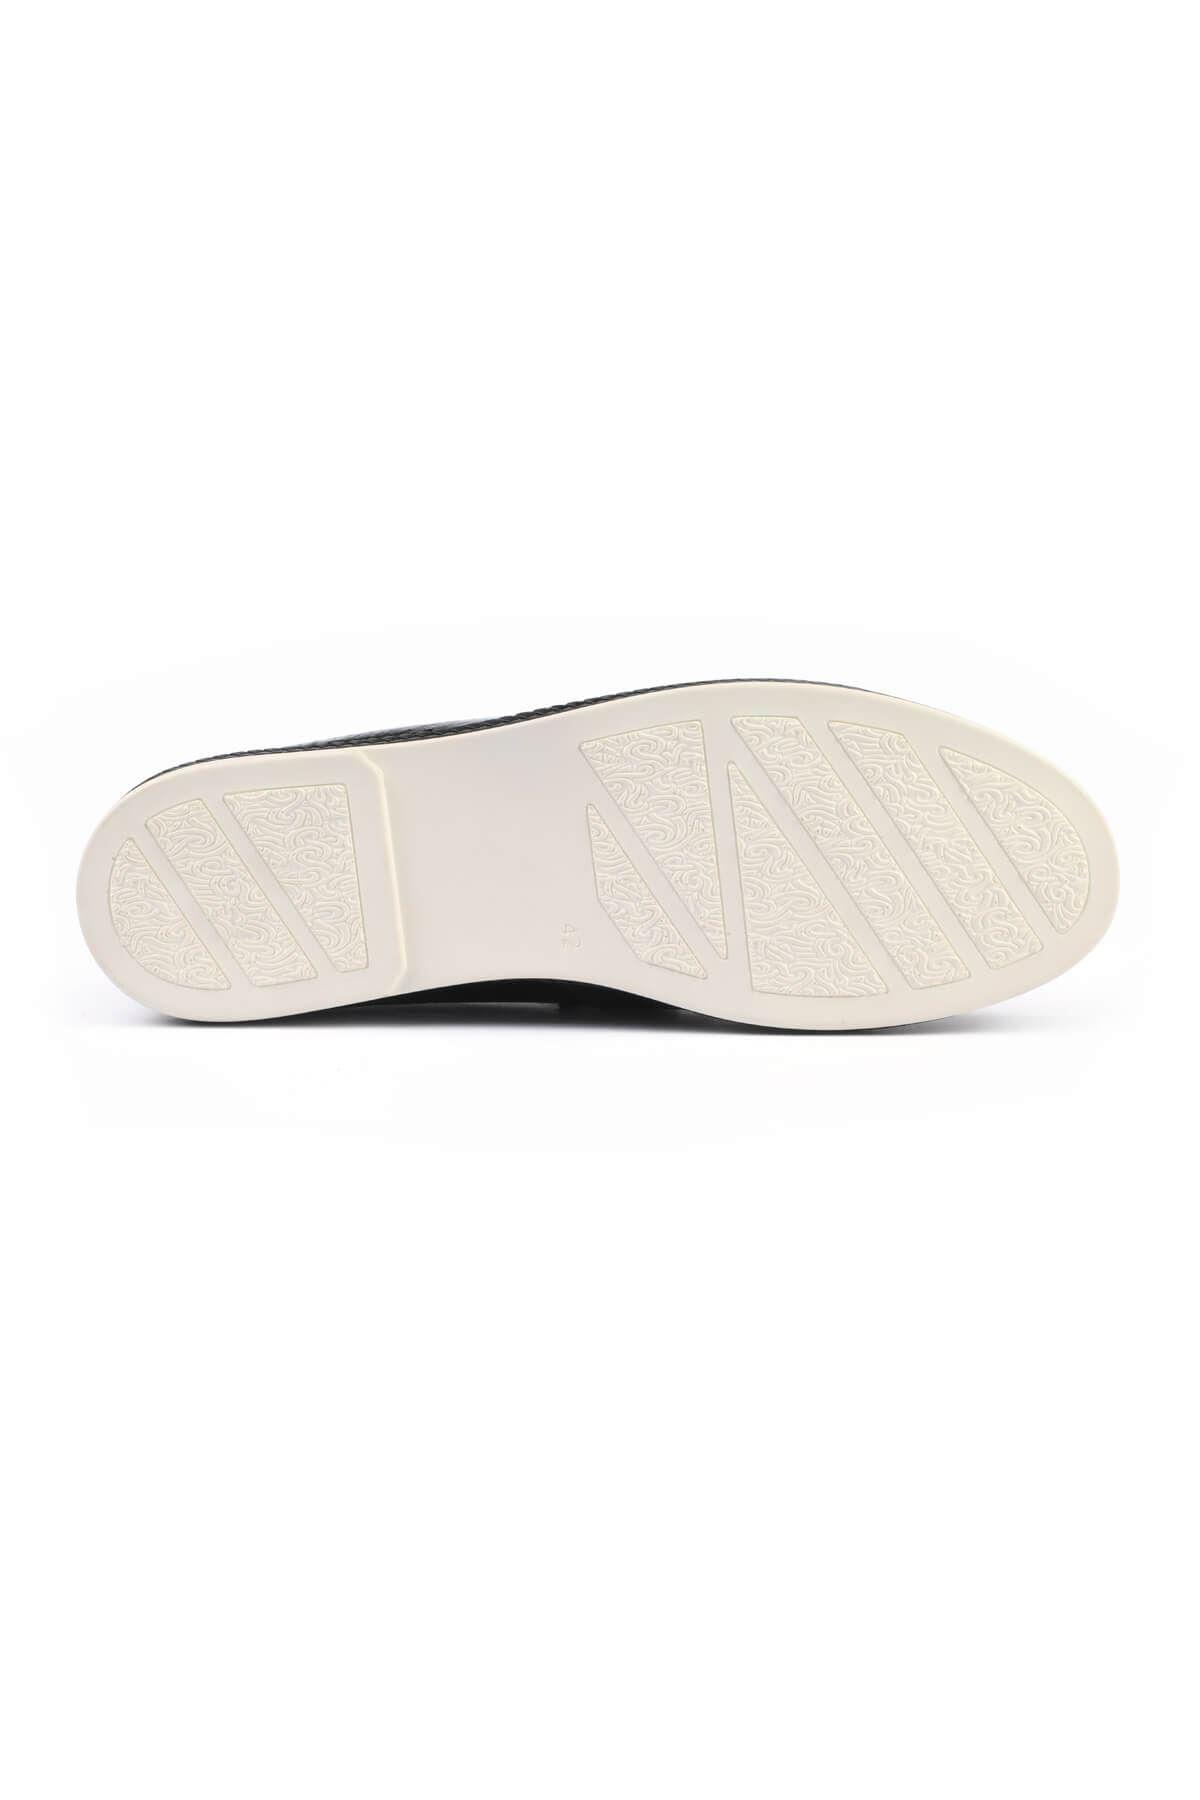 Libero C822 Lacivert Loafer Ayakkabı